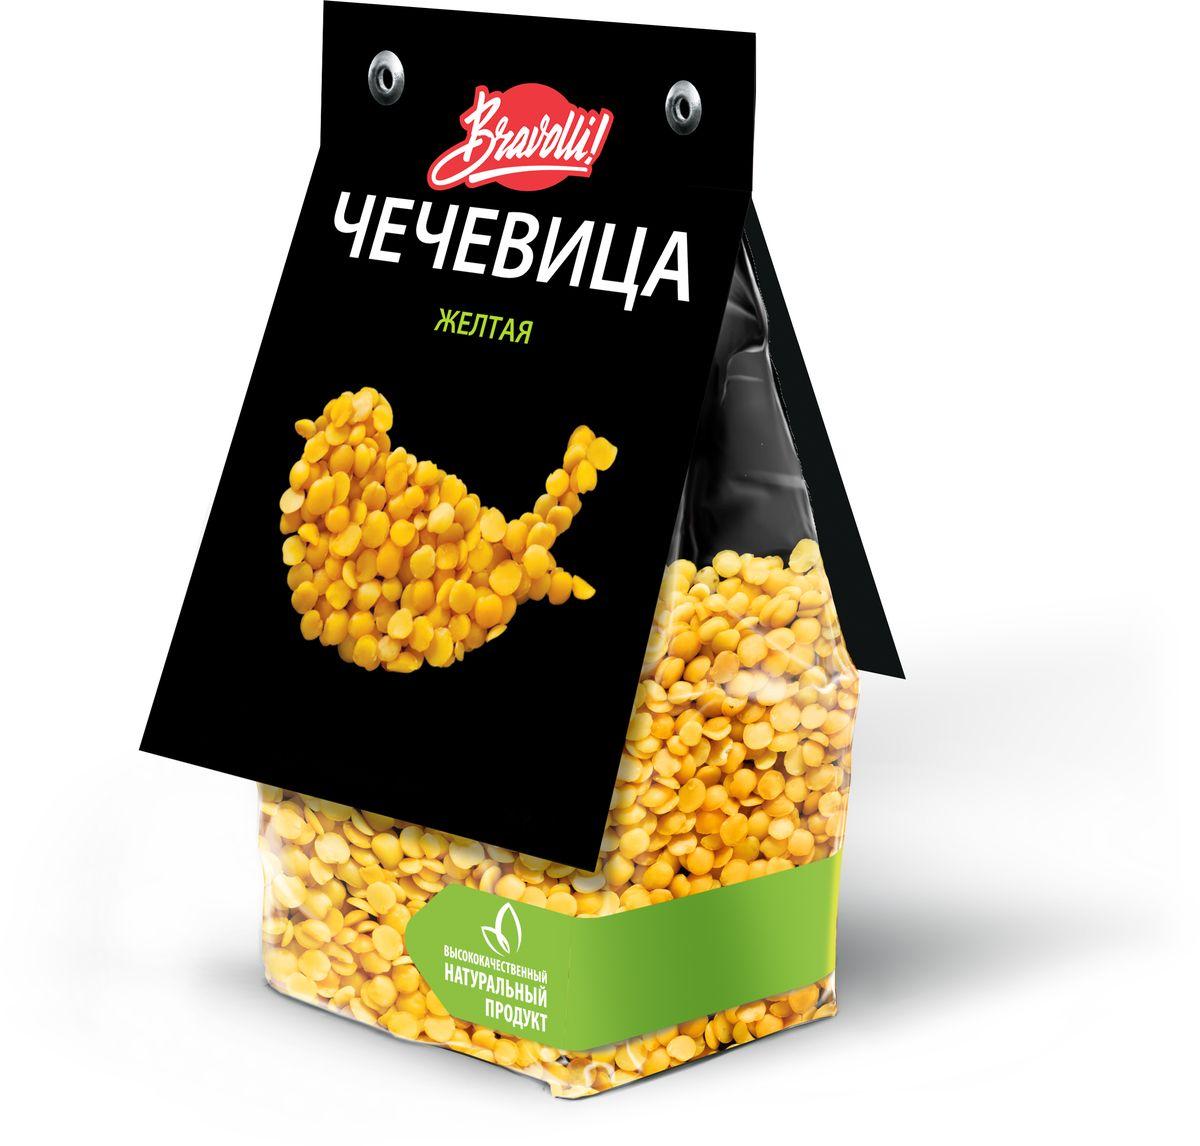 Bravolli Чечевица желтая, 350 г bravolli нут 350 г